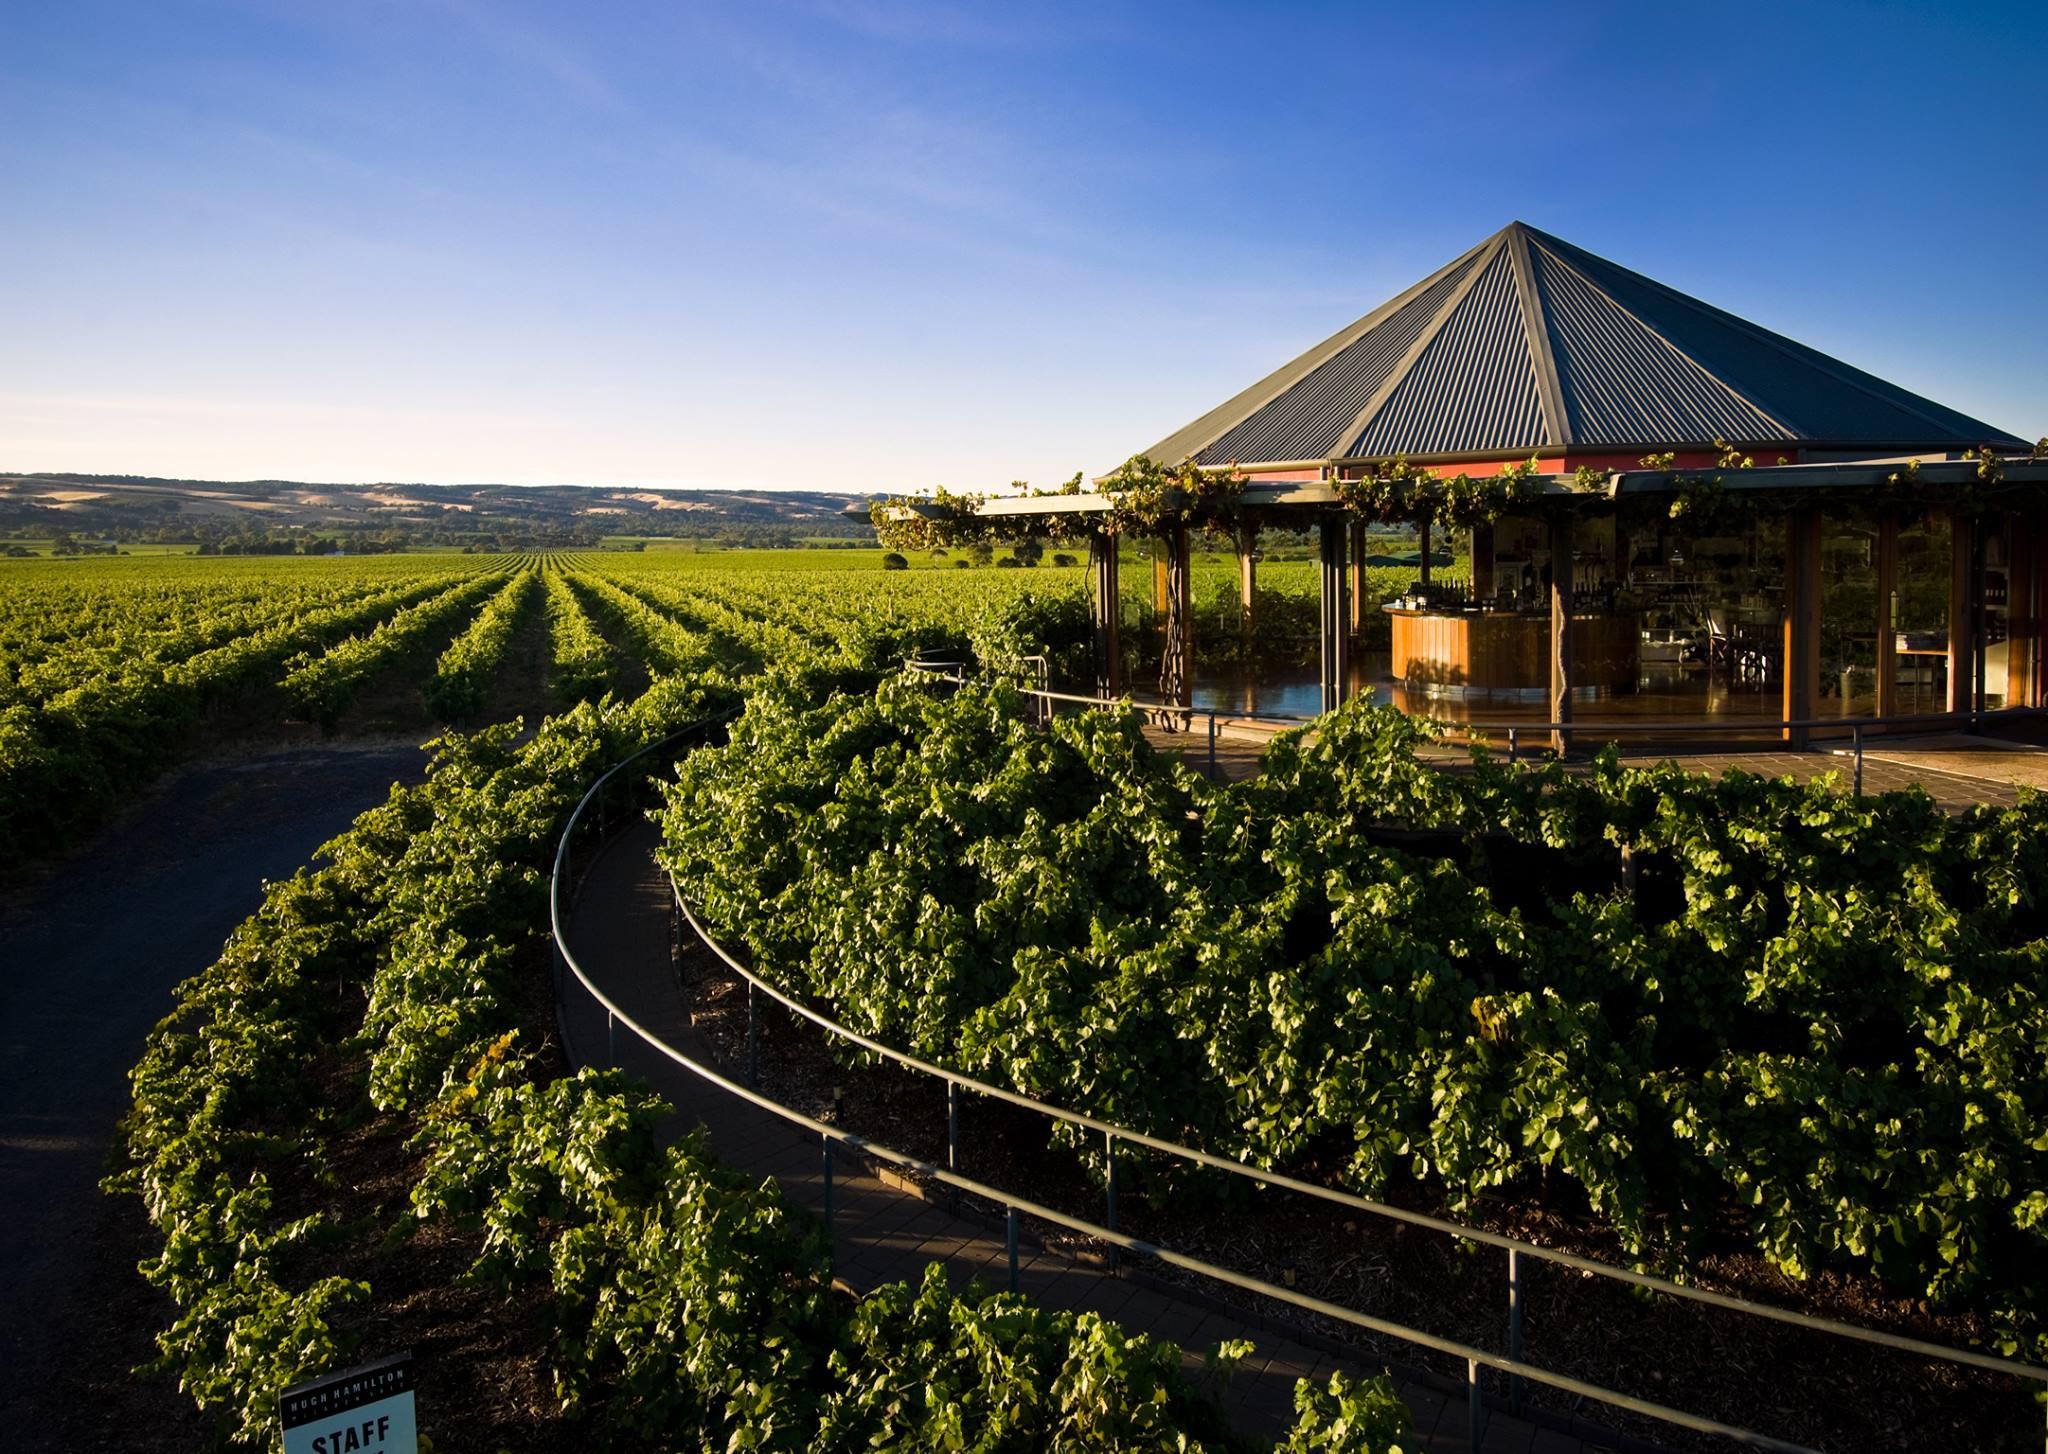 Splendid vineyard of the Hugh Hamilton Wines winery